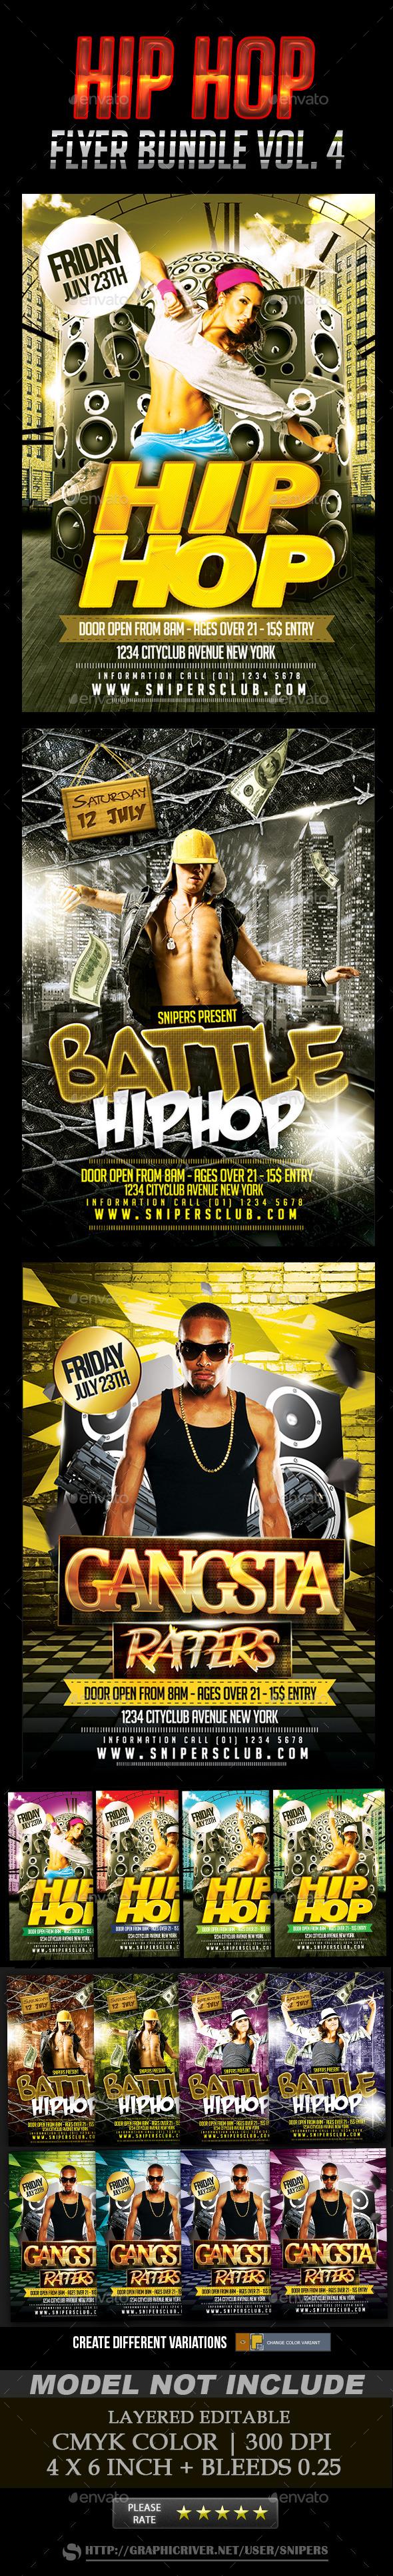 Hip Hop Flyer Bundle Vol. 4 - Events Flyers